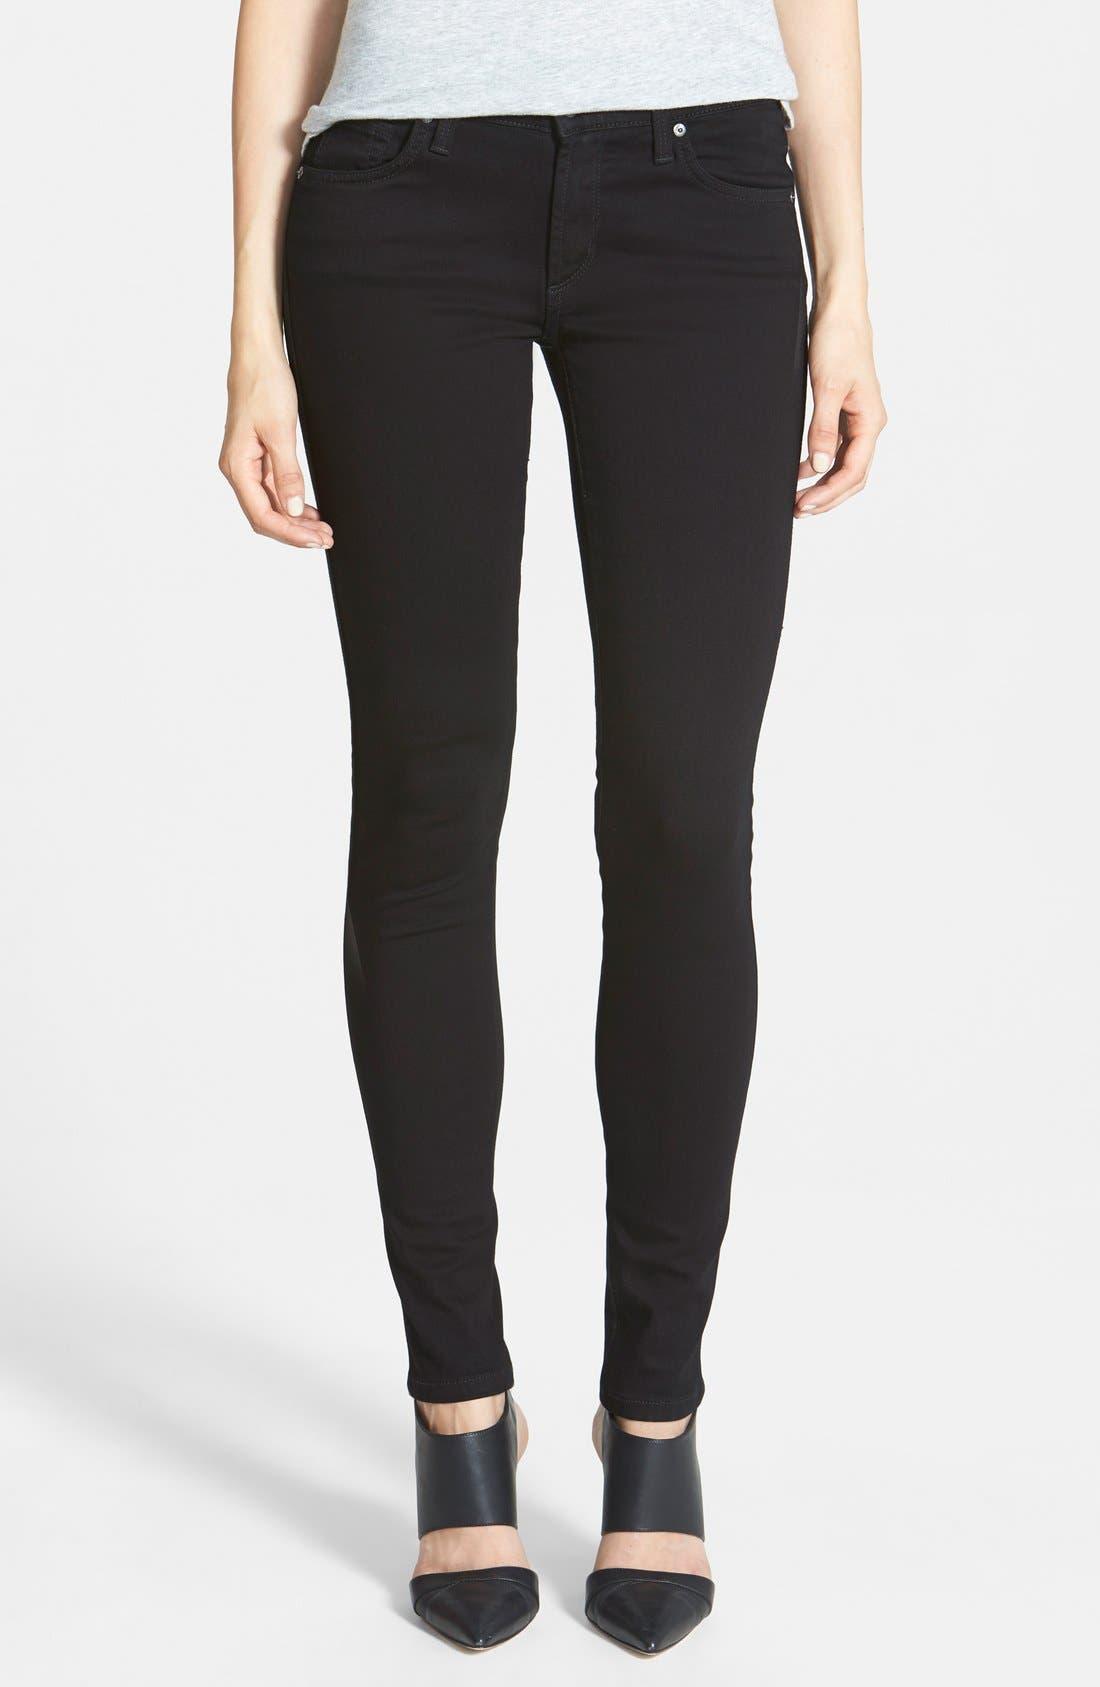 Alternate Image 1 Selected - James Jeans 'Twiggy' Five Pocket Leggings (Black Clean)